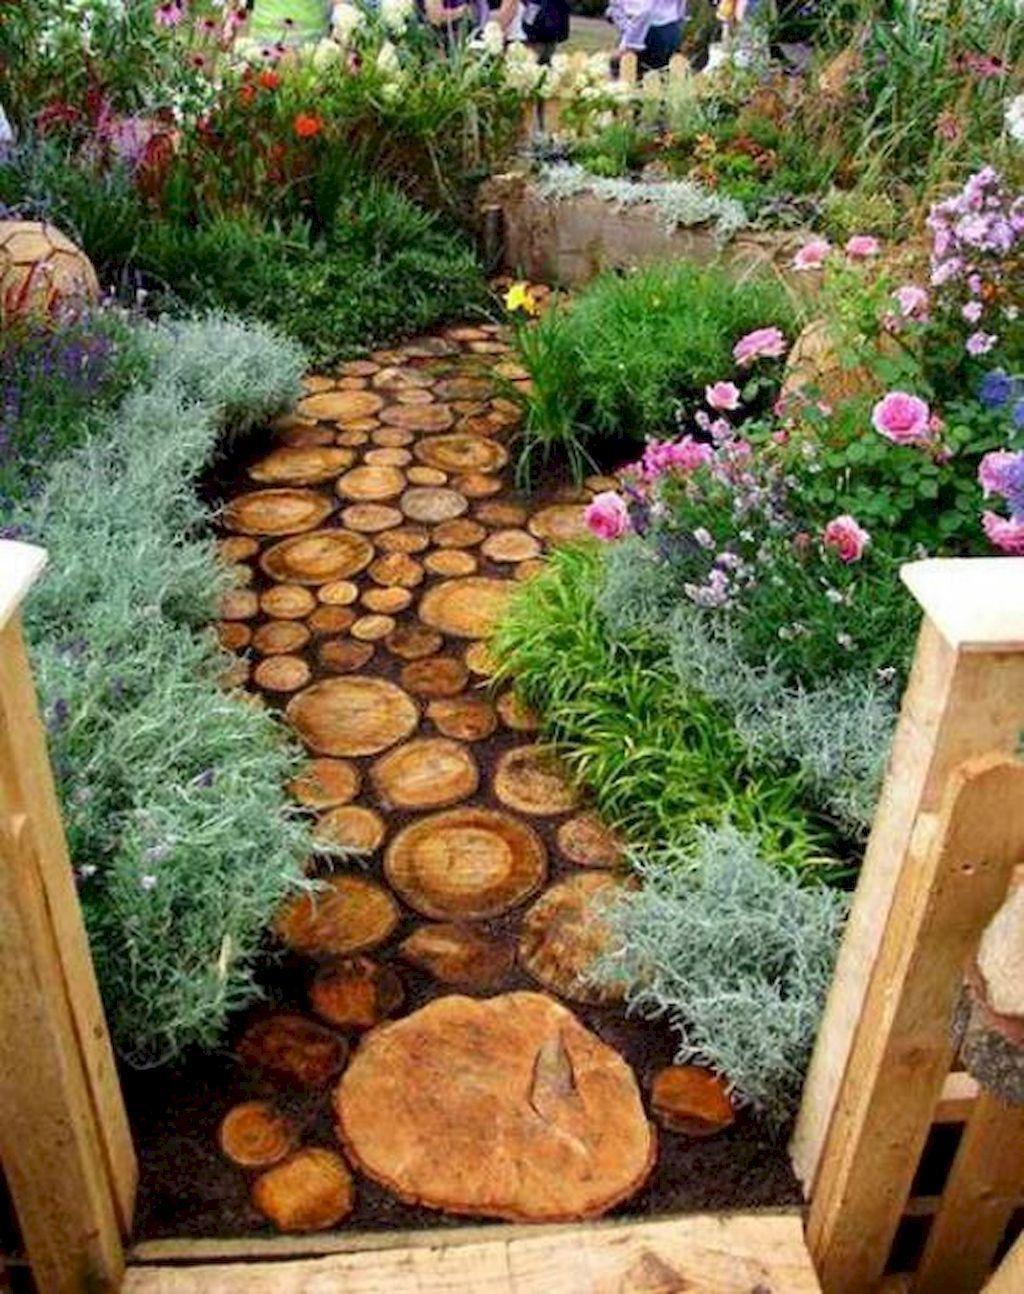 35 Stunning Walkways Ideas For Backyards And Gardens Carolanne News In 2020 Front Yard Garden Design Small Backyard Landscaping Diy Garden